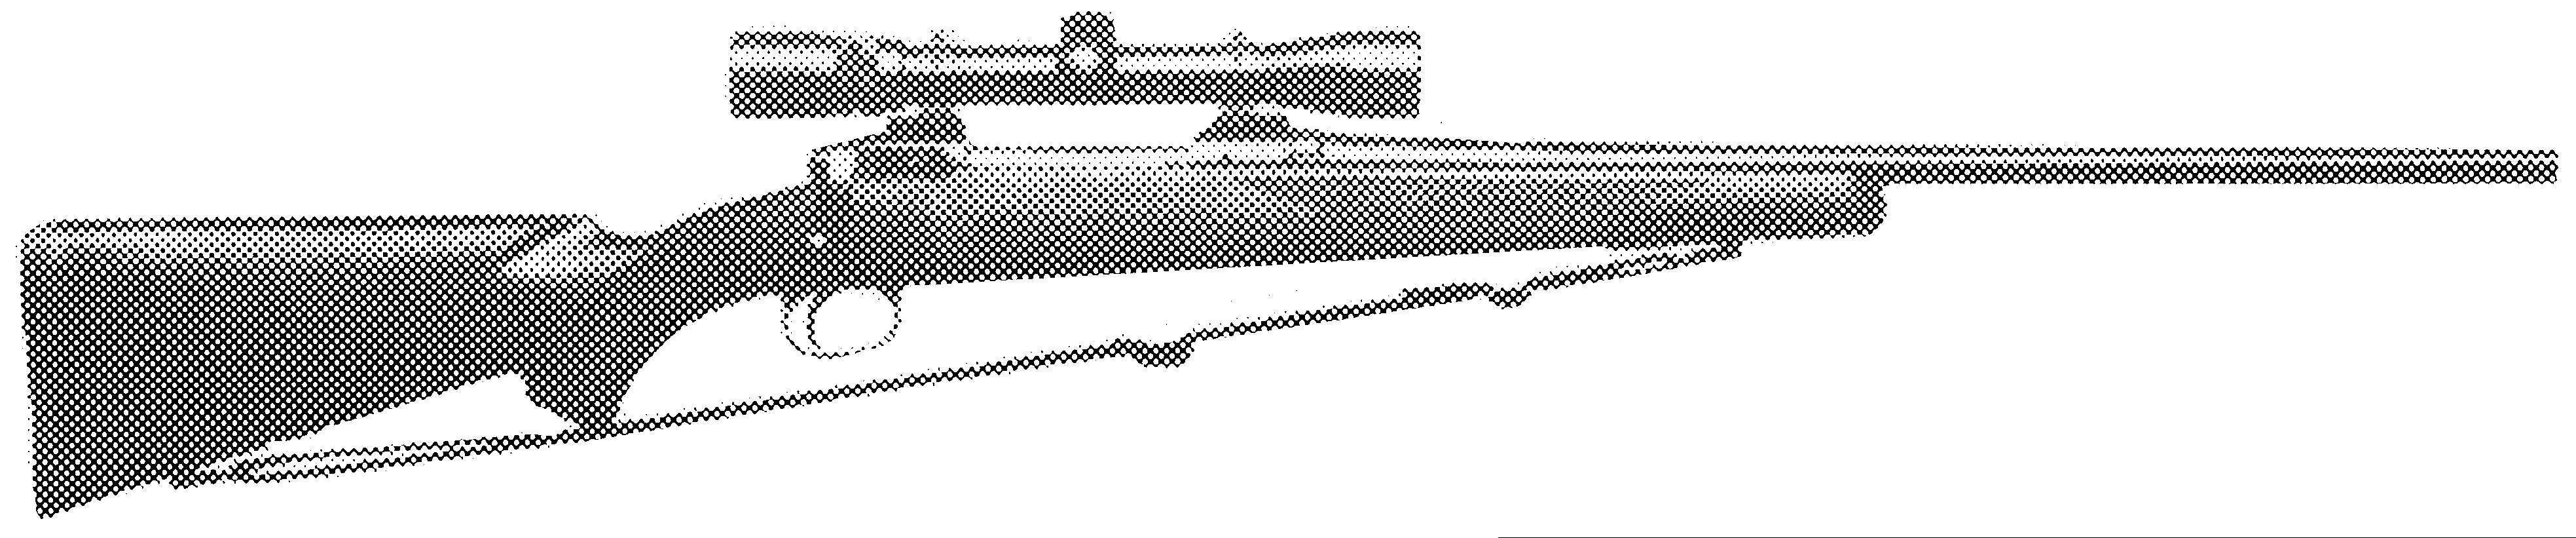 Model 111FXP3